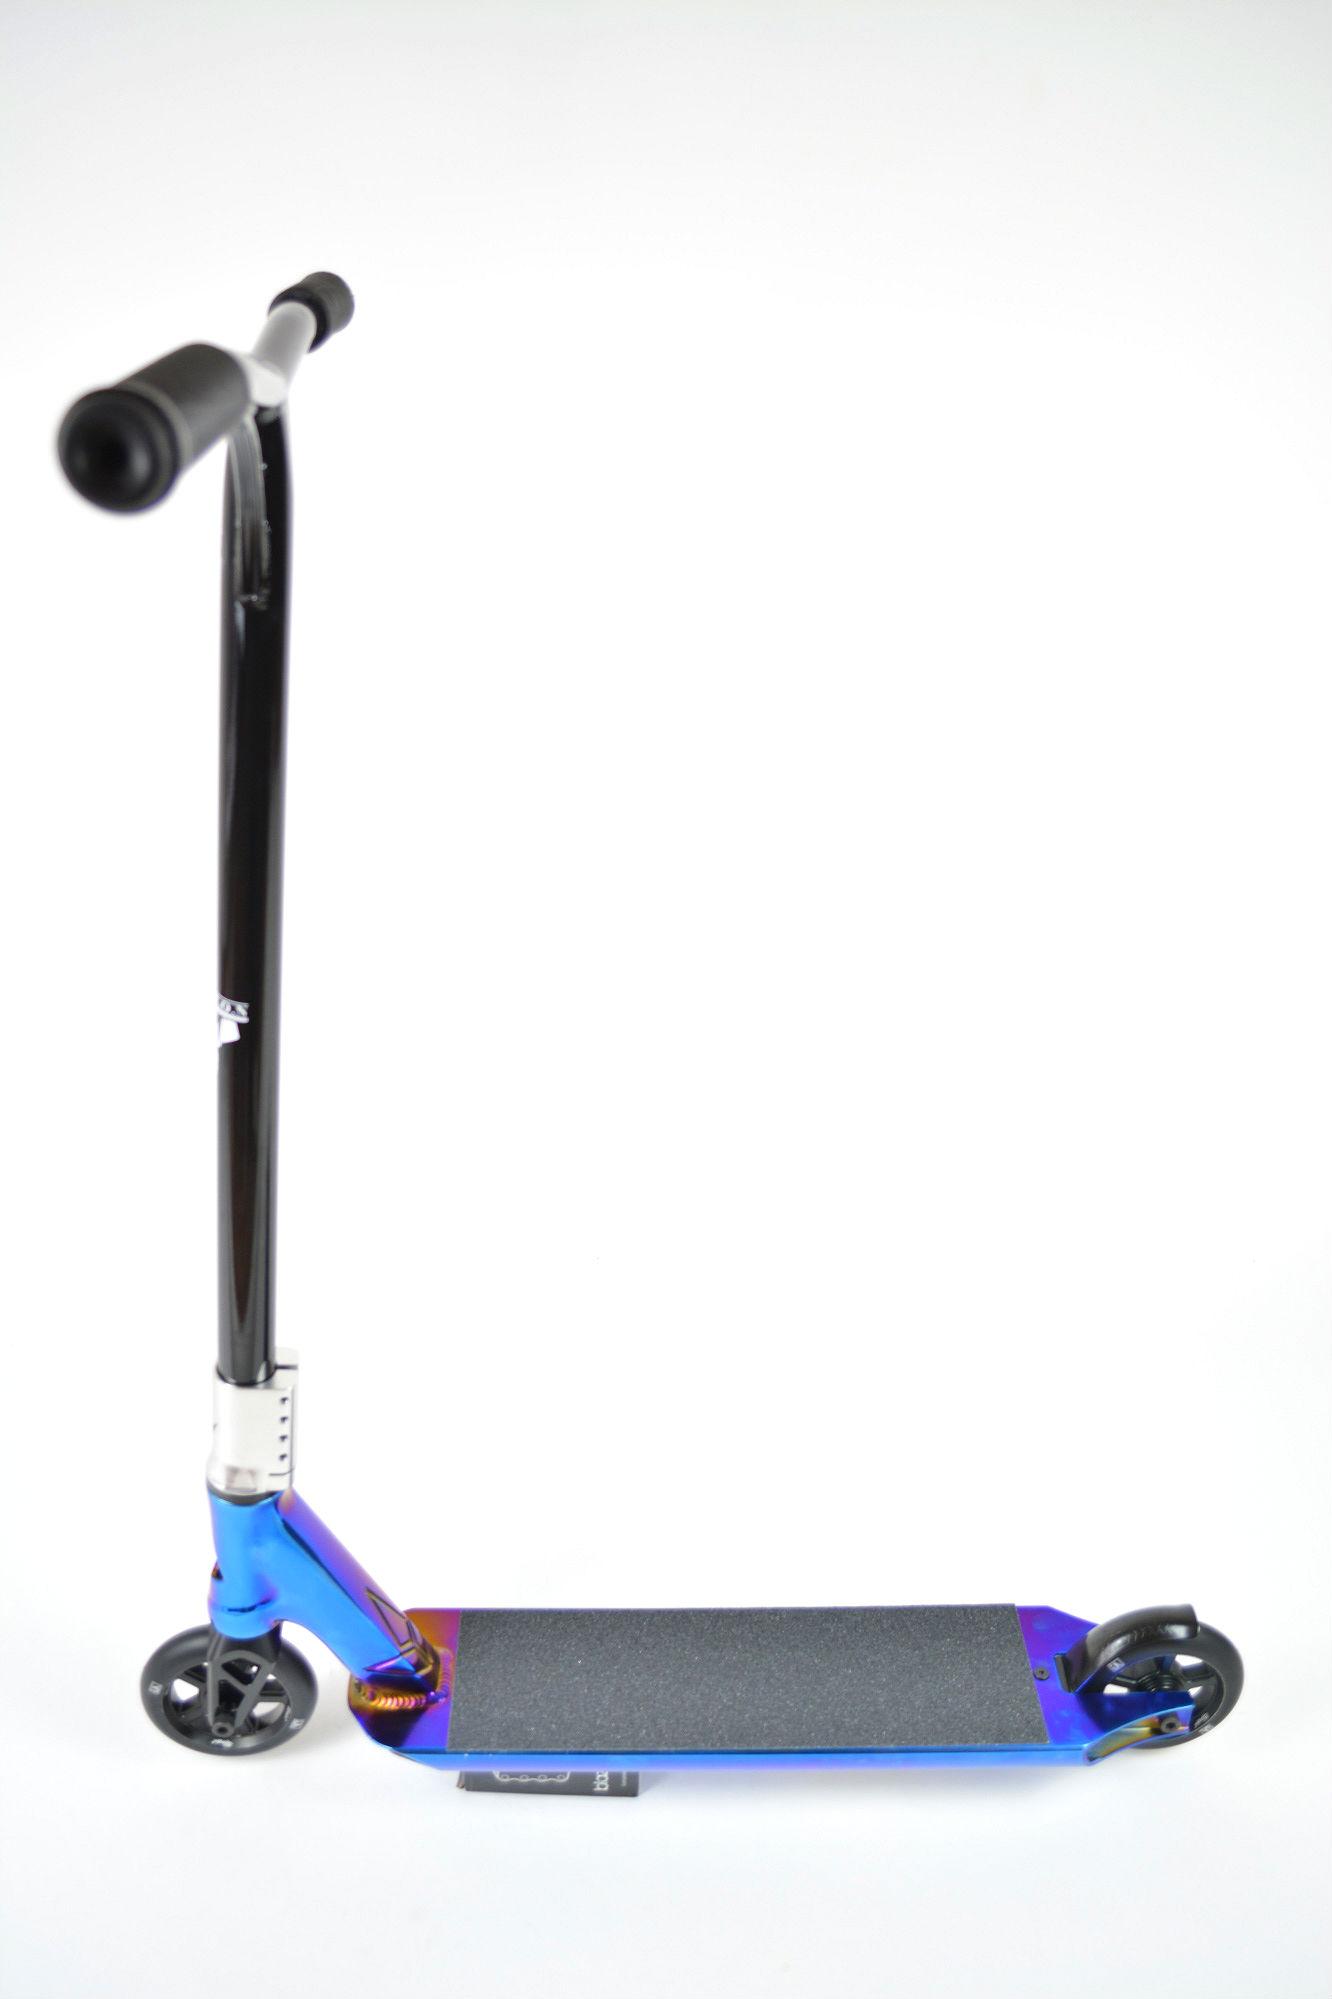 Blunt AOS V3 Jesse Ikedah Patron Custom Stunt Scooter Black